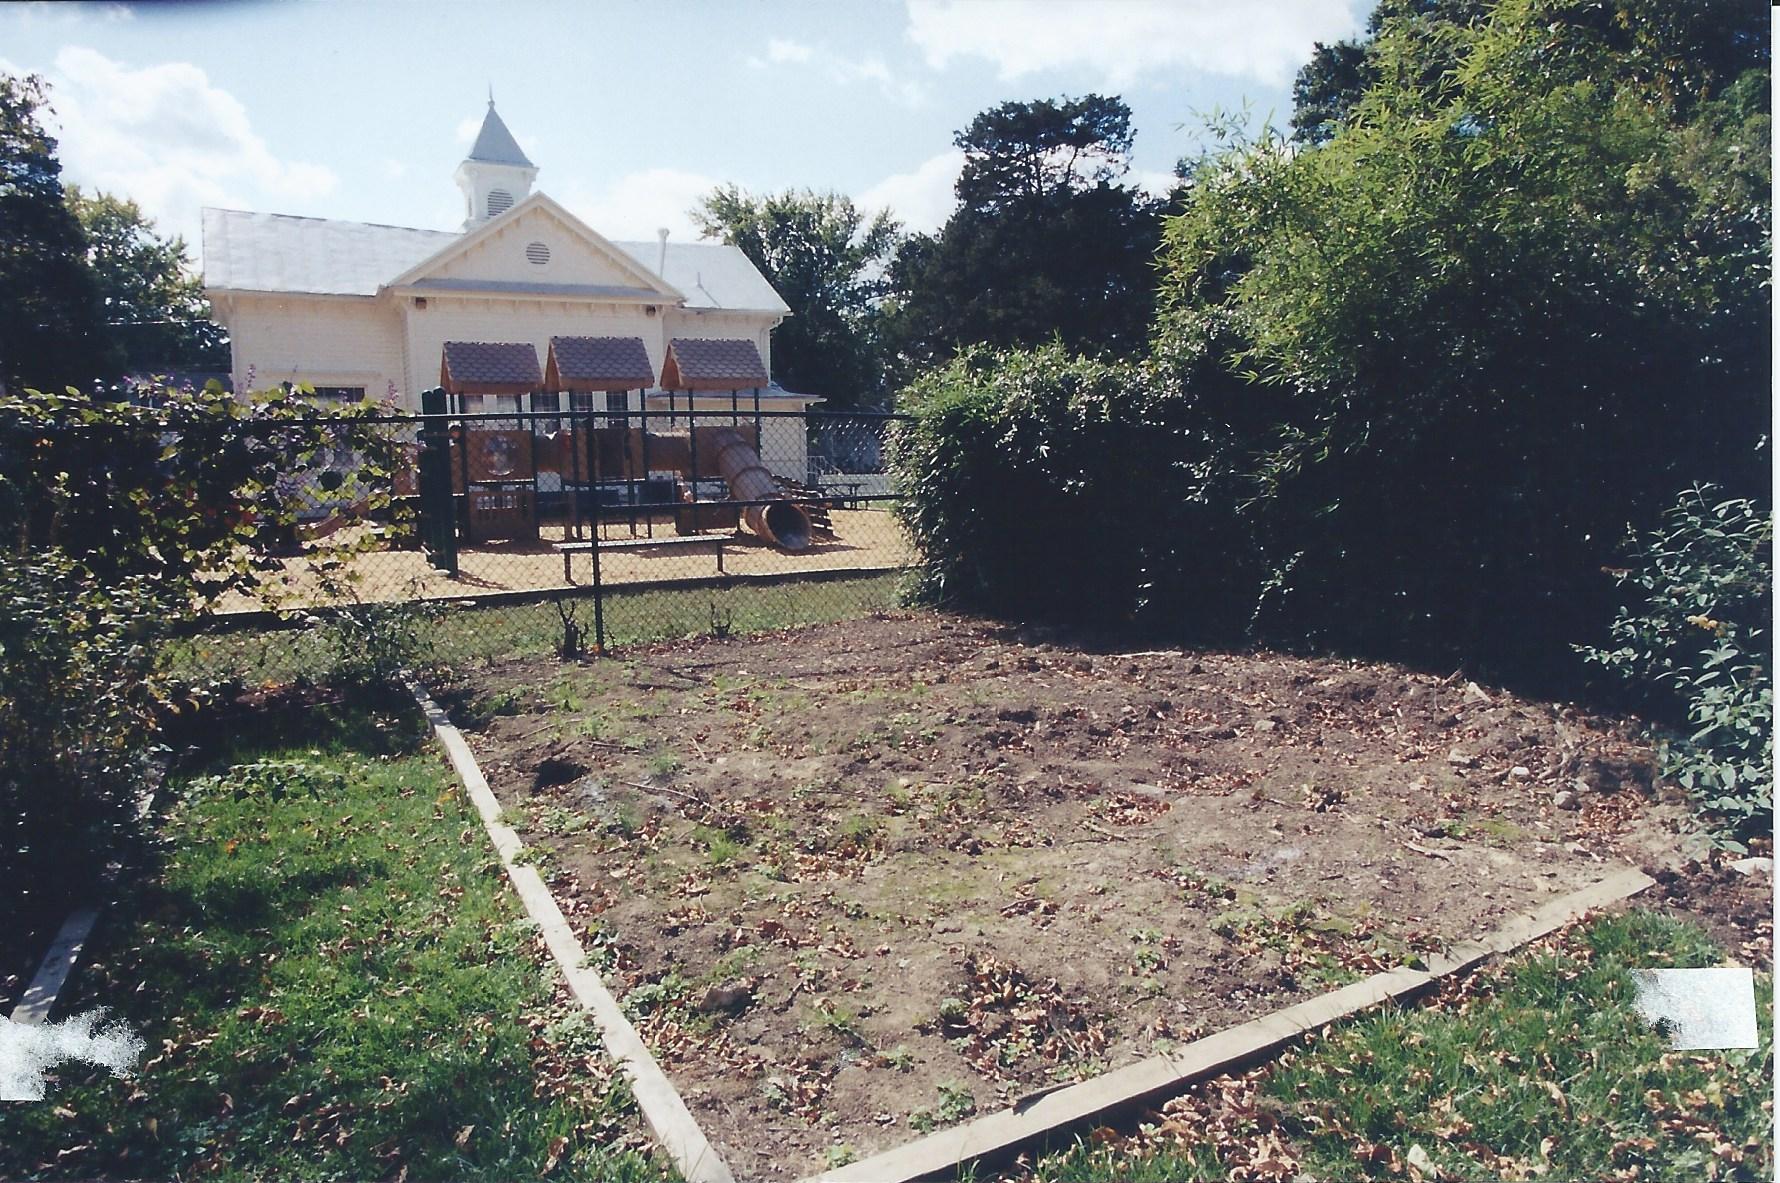 Quarry Shade Garden At Bon Air Park: Season Of Change For Judy Funderburk